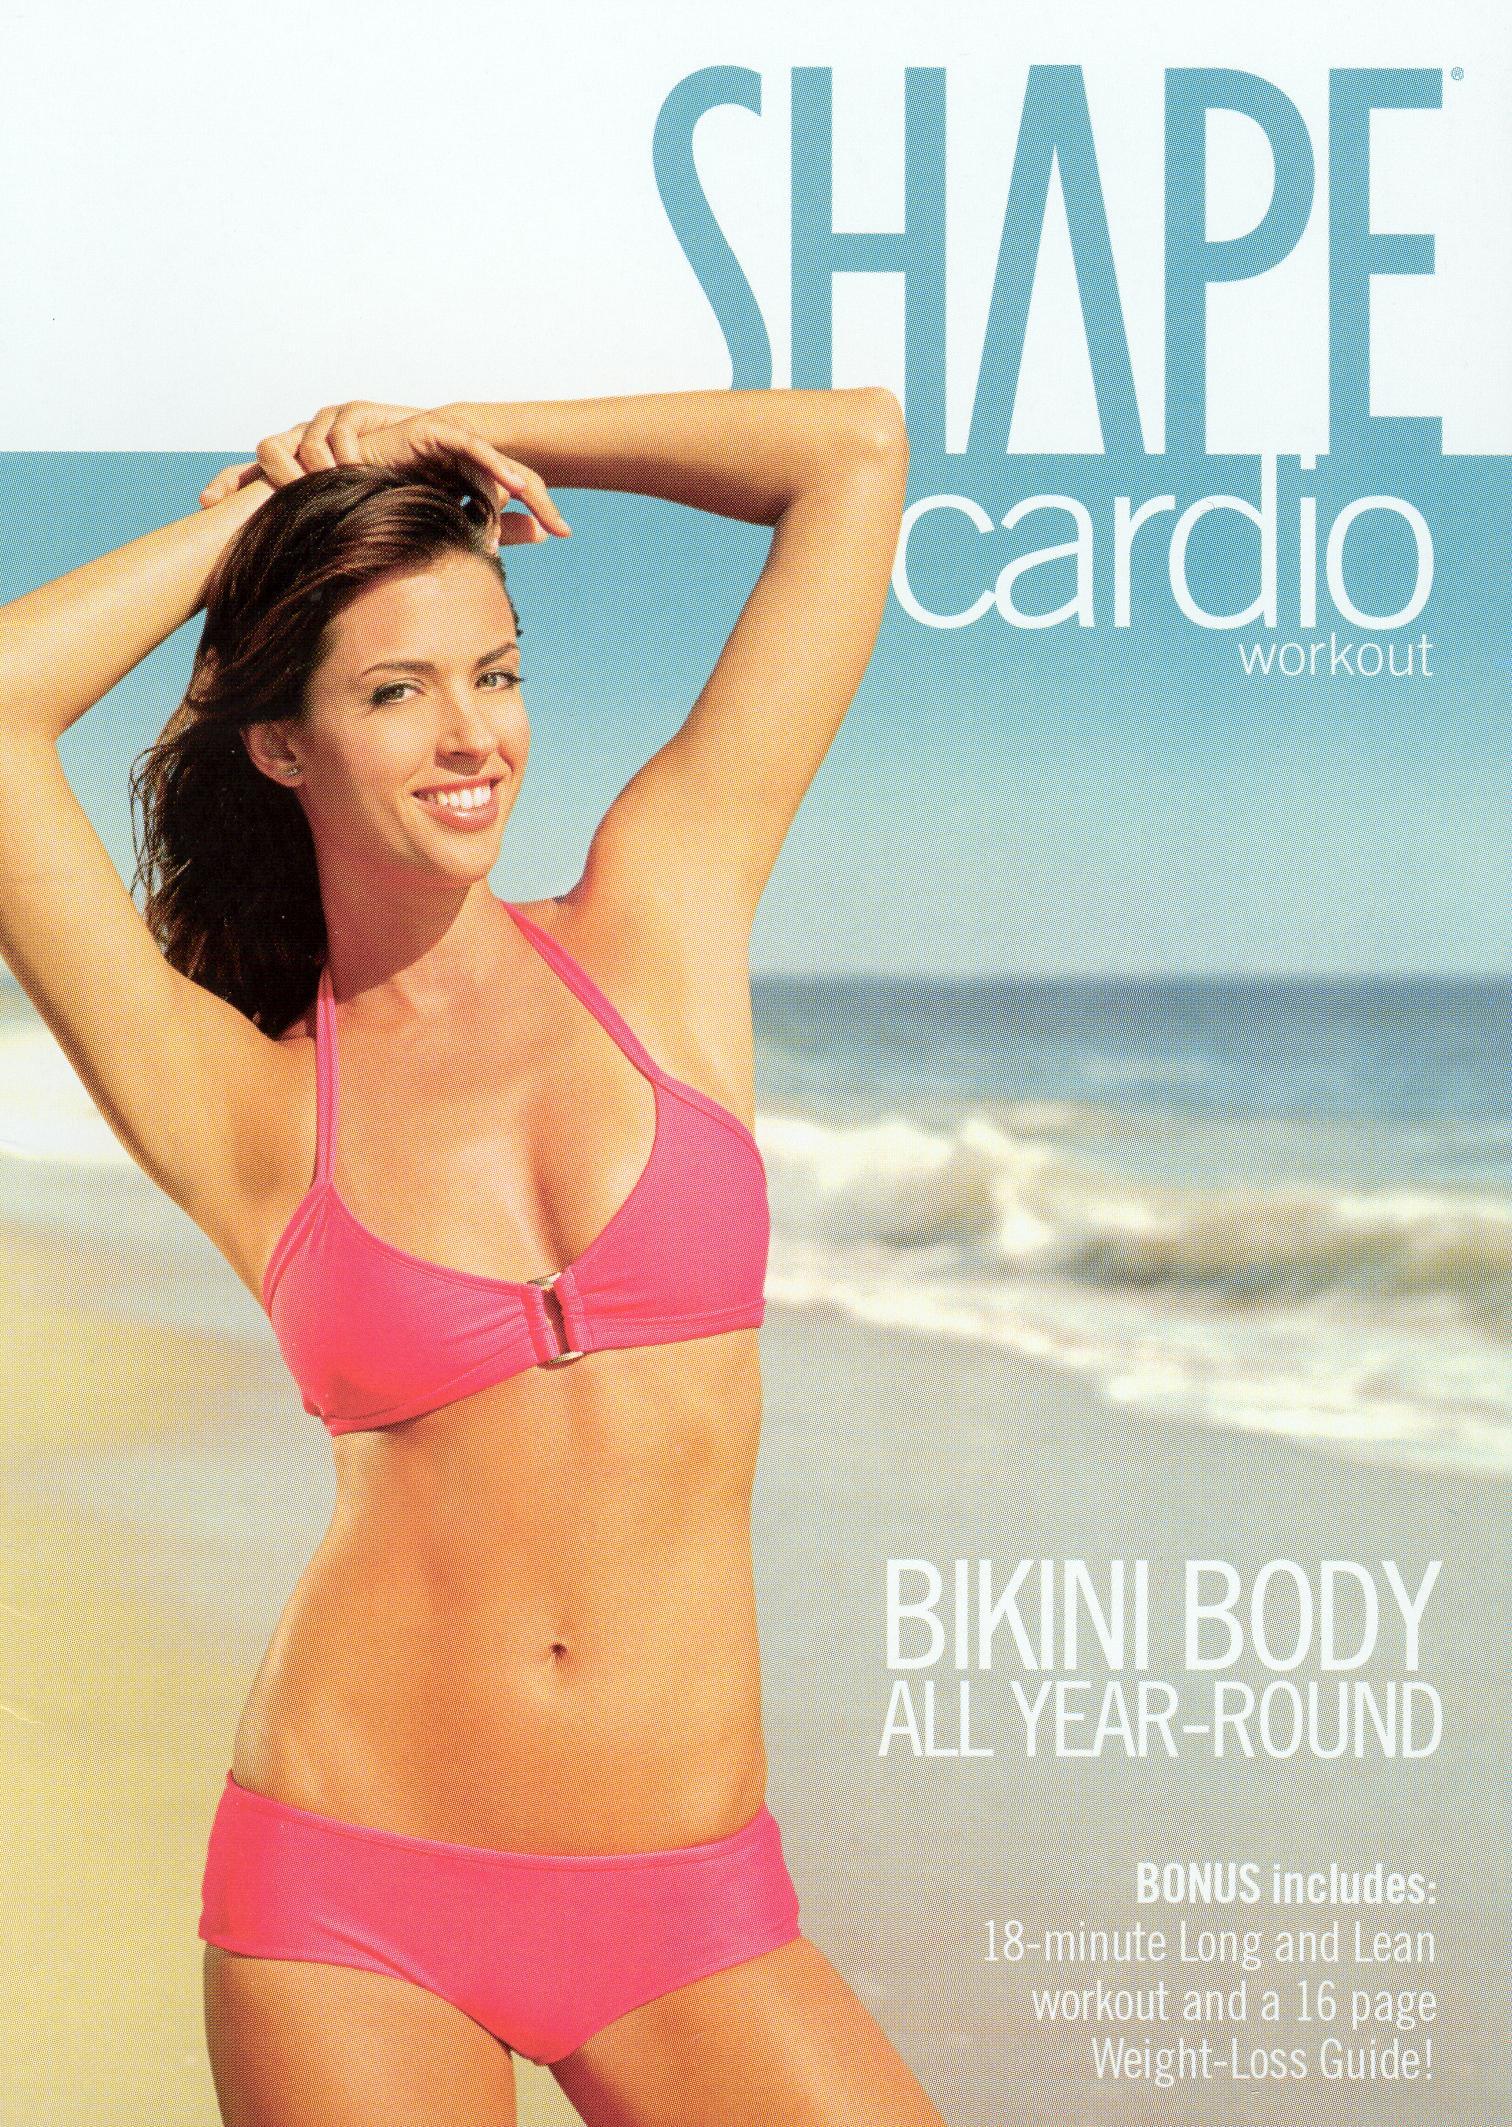 Shape: Cardio Workout - Bikini Body All Year Round